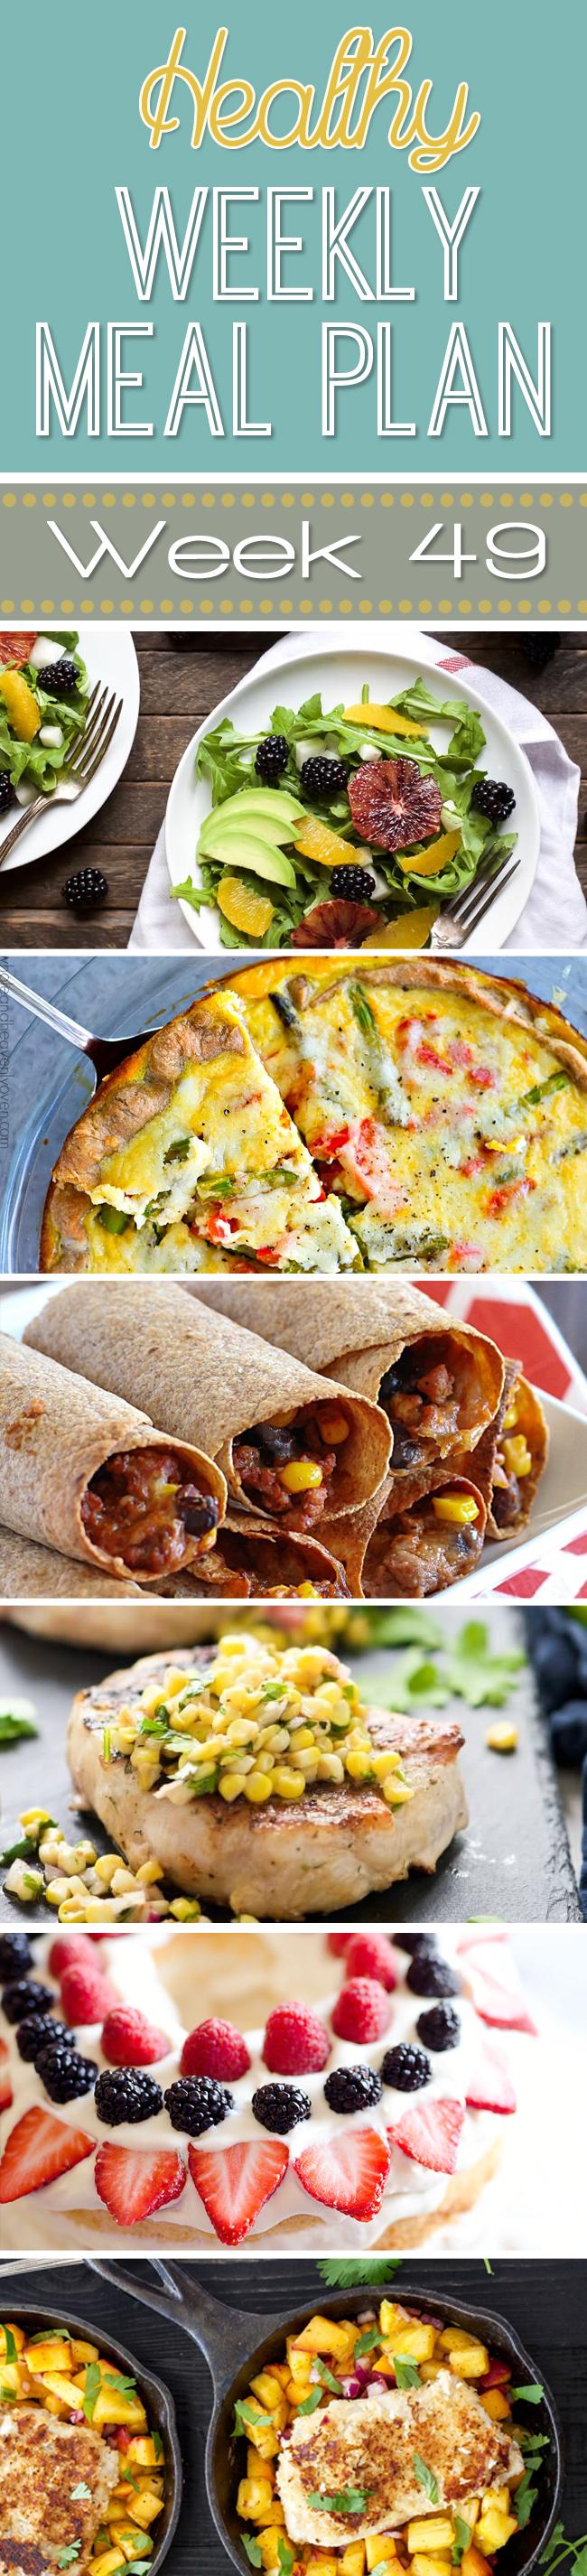 Healthy Weekly Meal Plan #49